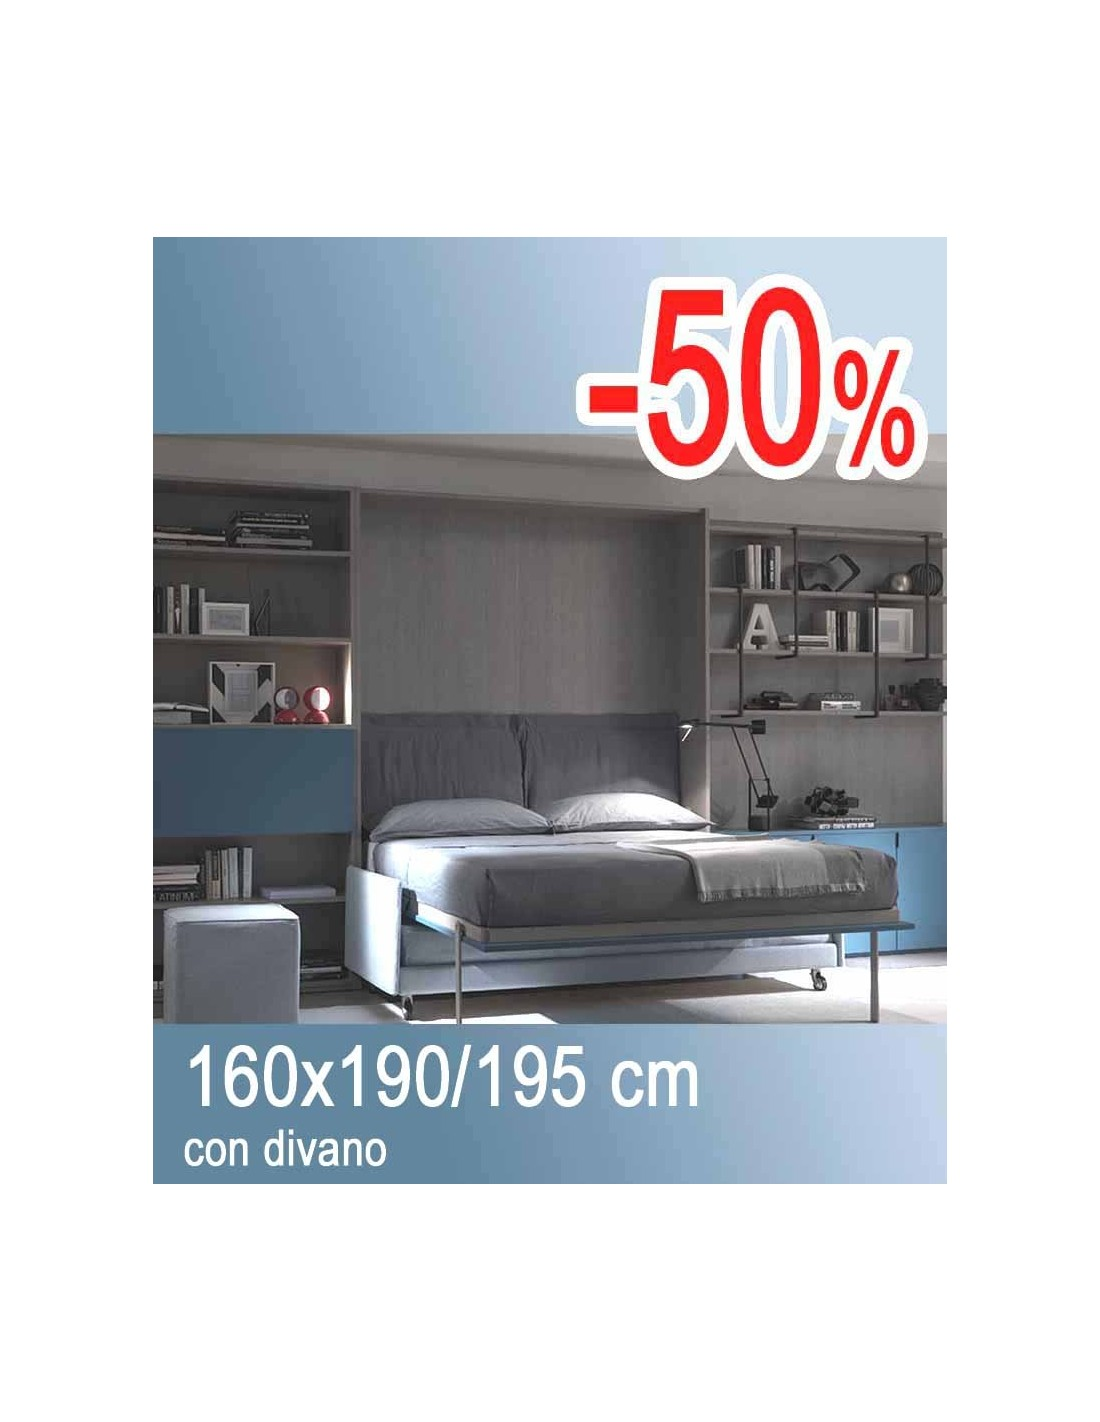 https://www.migliormaterasso.it/2769-thickbox_default/letto-scomparsa-matrimoniale-divano.jpg